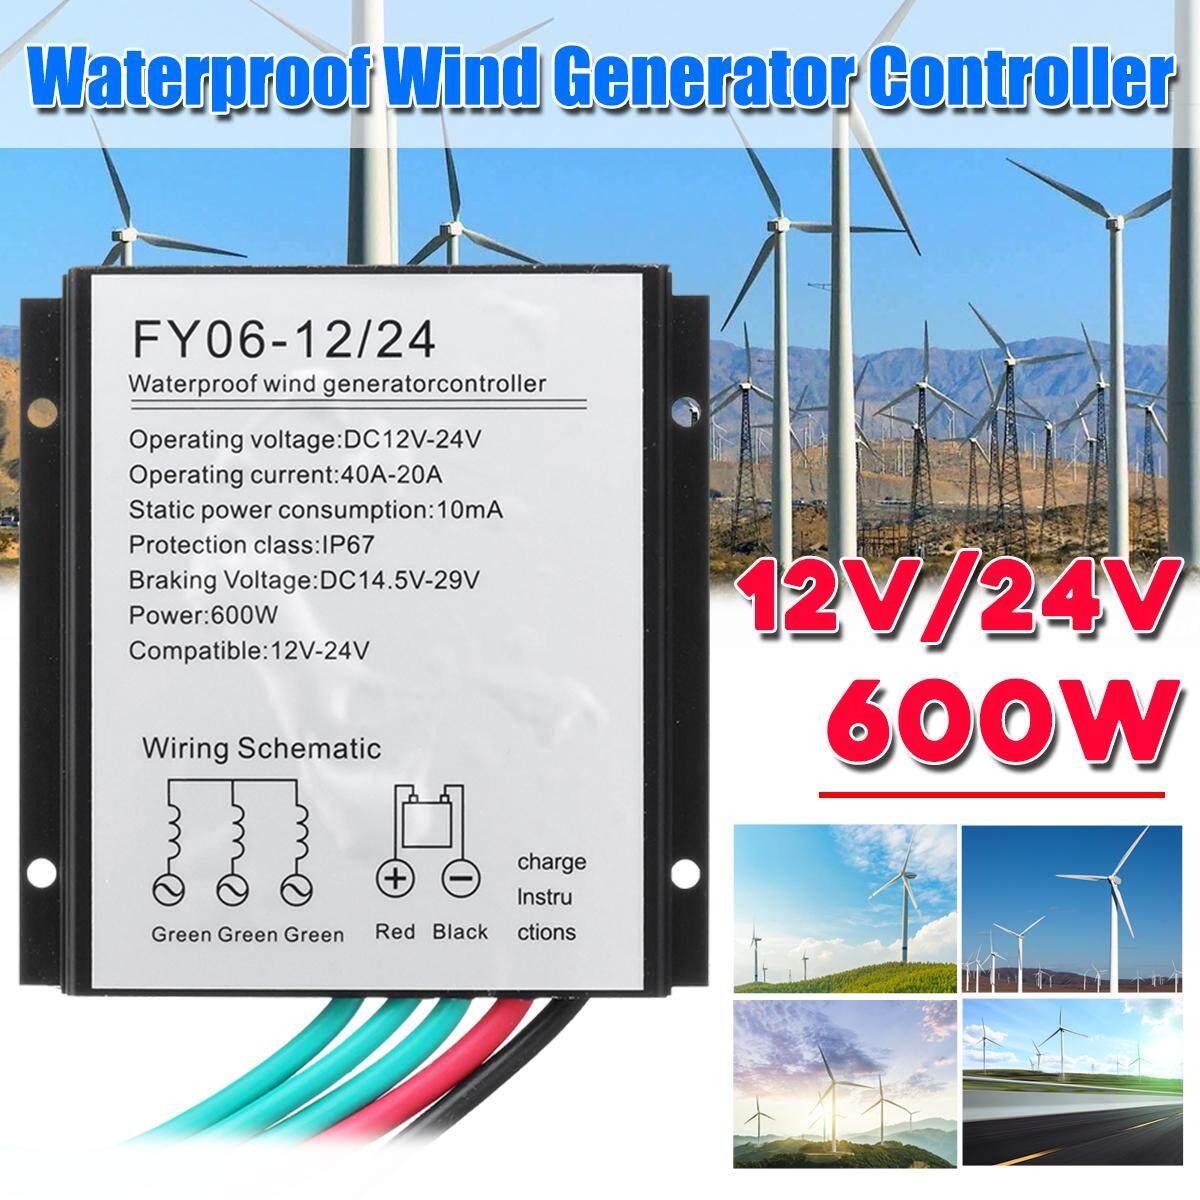 12v/24v 600w Ip67 Wind Turbine Generator Charge Controller Regulators Waterproof By Moonbeam.